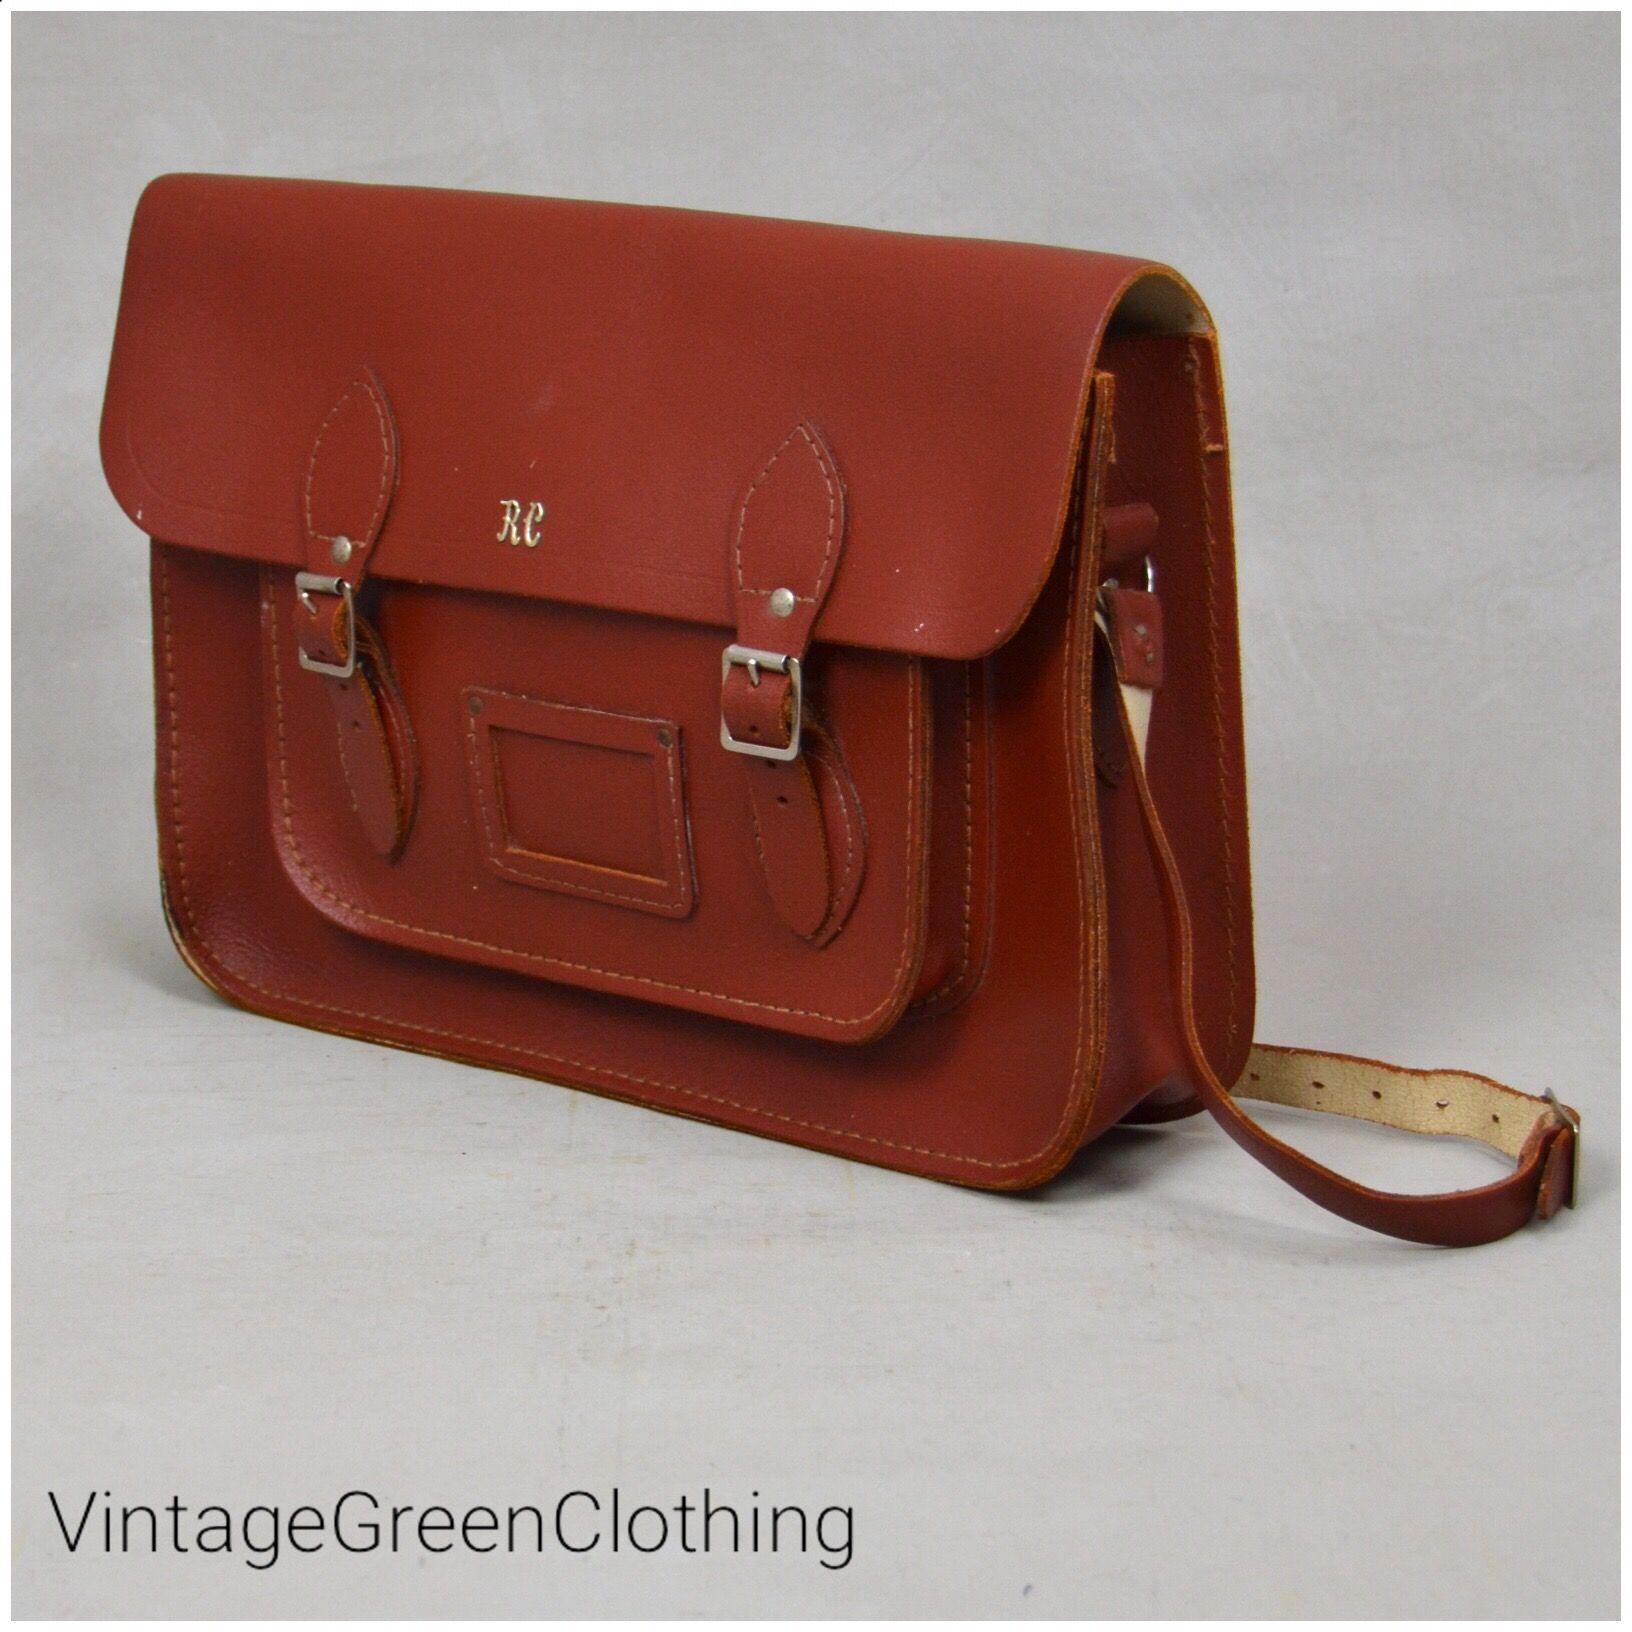 Vintage School Satchel 1960 S Brown Tan Leather Satchel With Adjustable Shoulder Strap English School Bag With Buckle Fastening Satchel School Satchel Leather Satchel